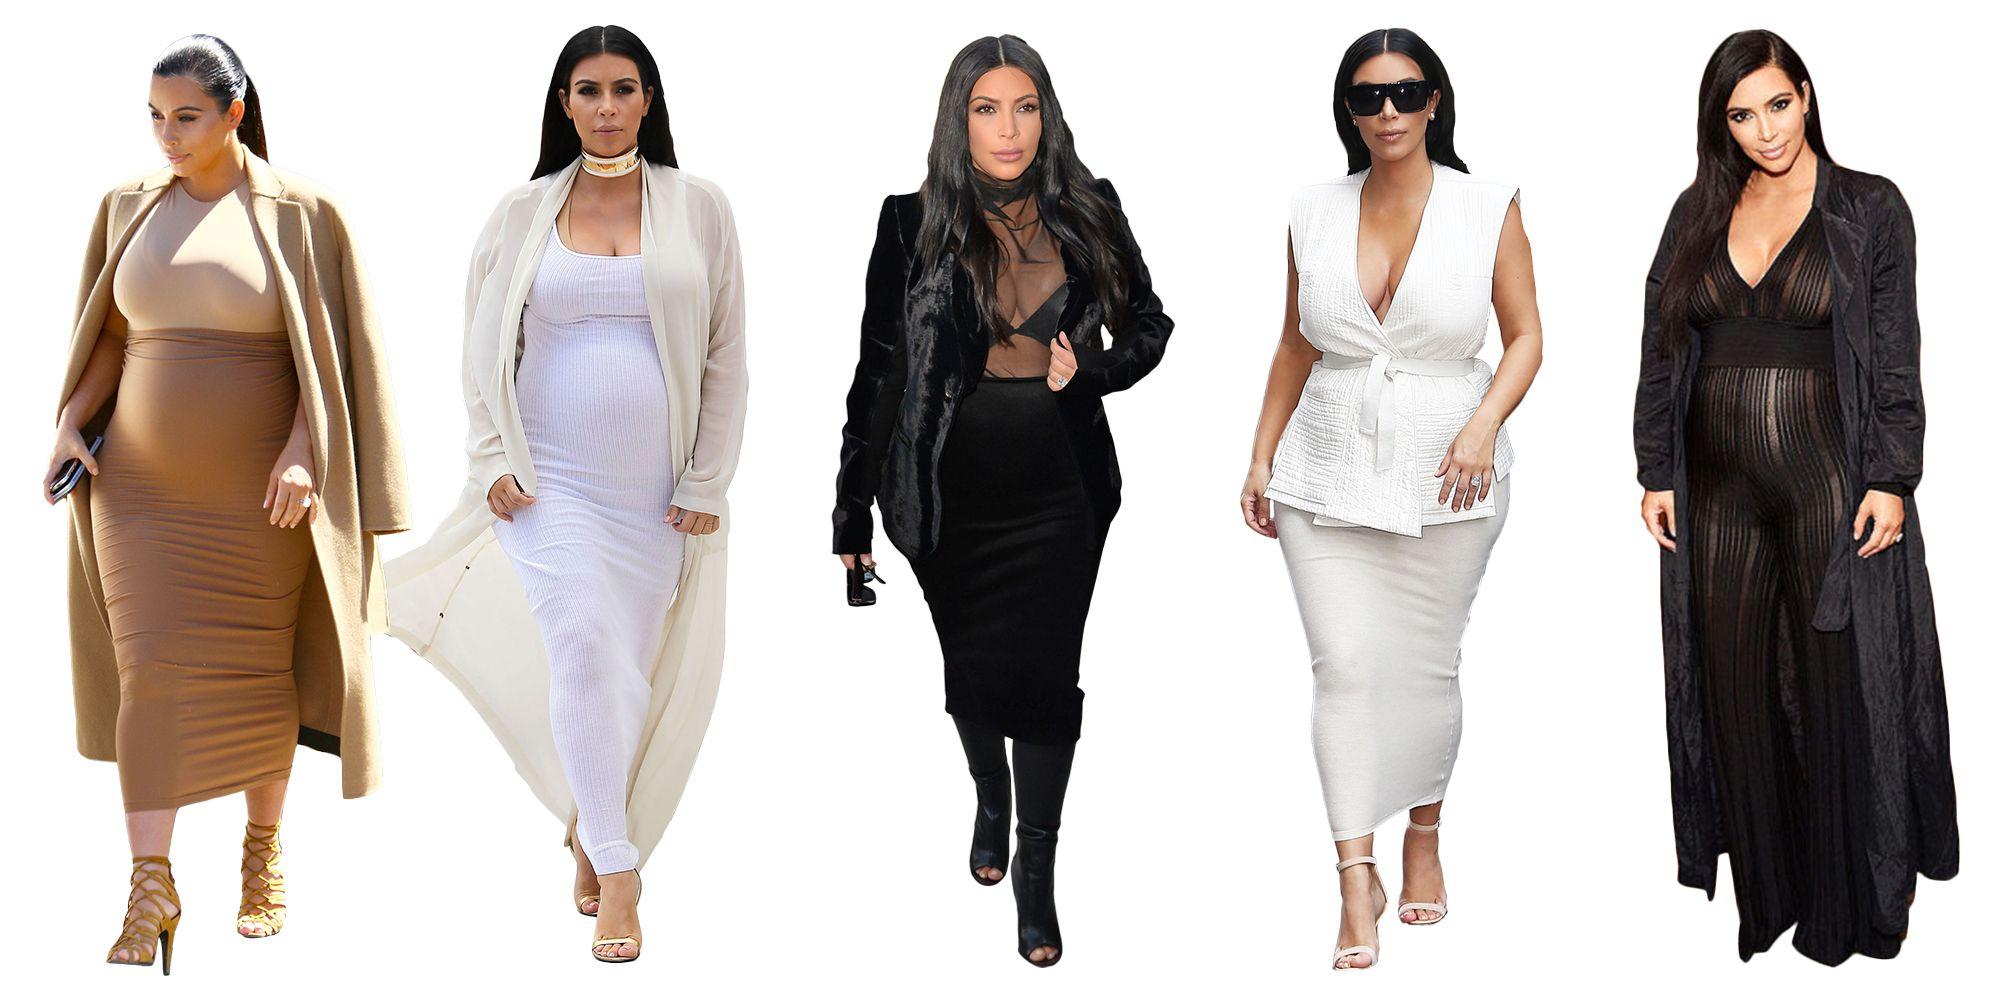 Kim Kardashian Maternity Style How Kim Kardashian Is Changing The Maternity Retail Landscape